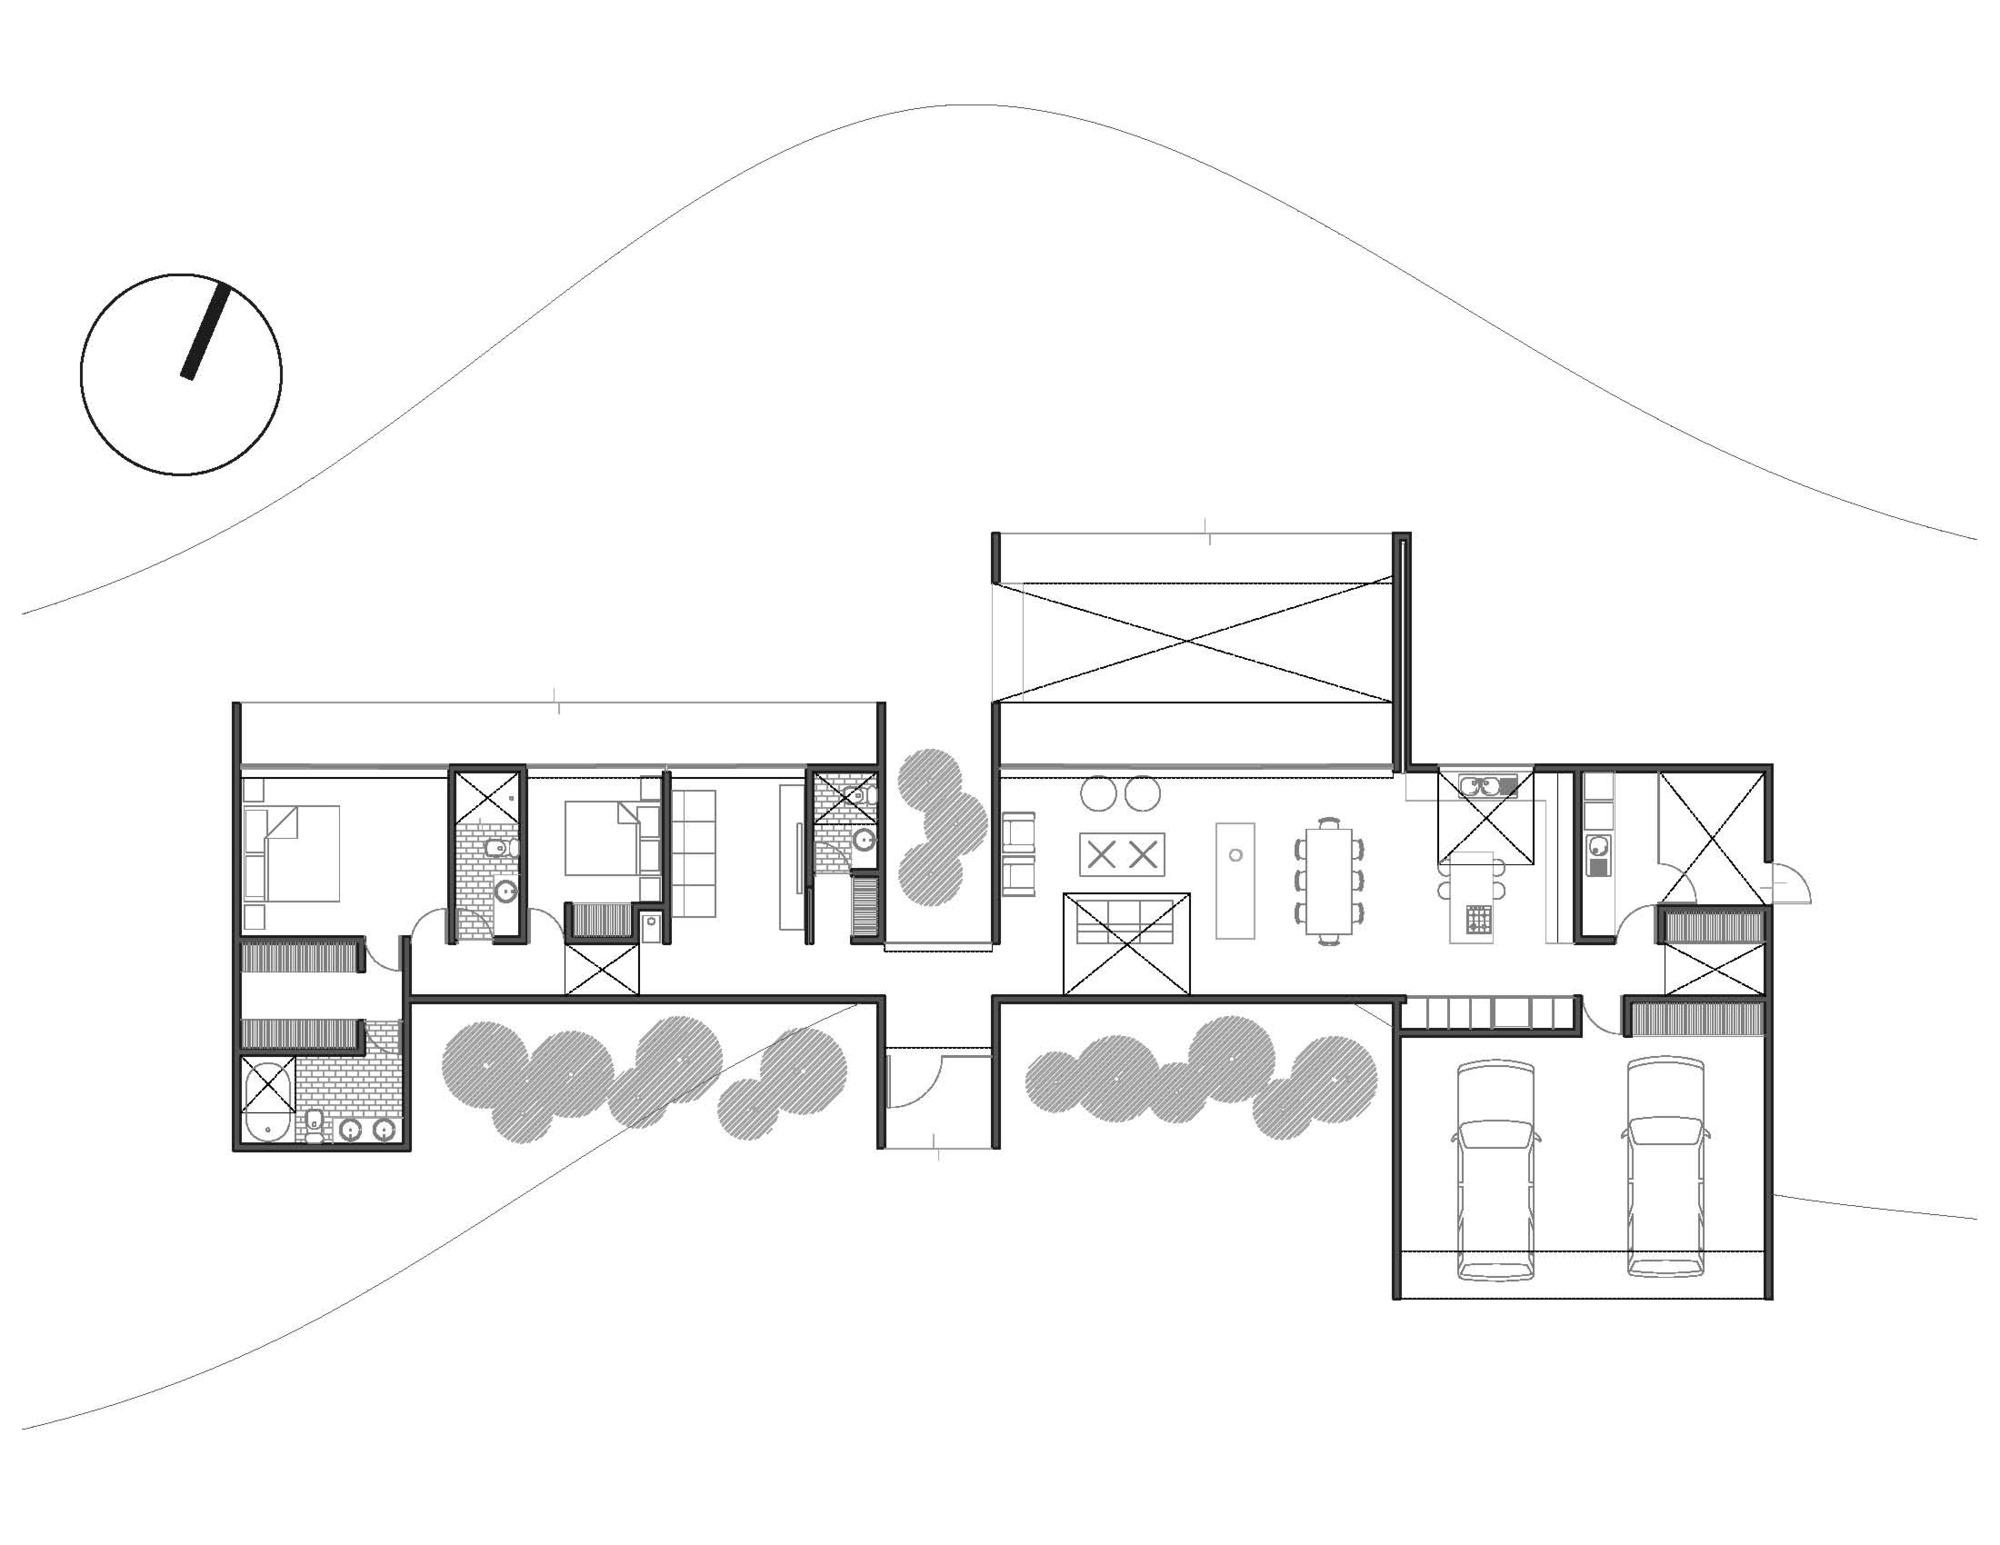 horizontal wiring home plan basic wiring home telephone gallery of lucernas house / 01 arq - 6